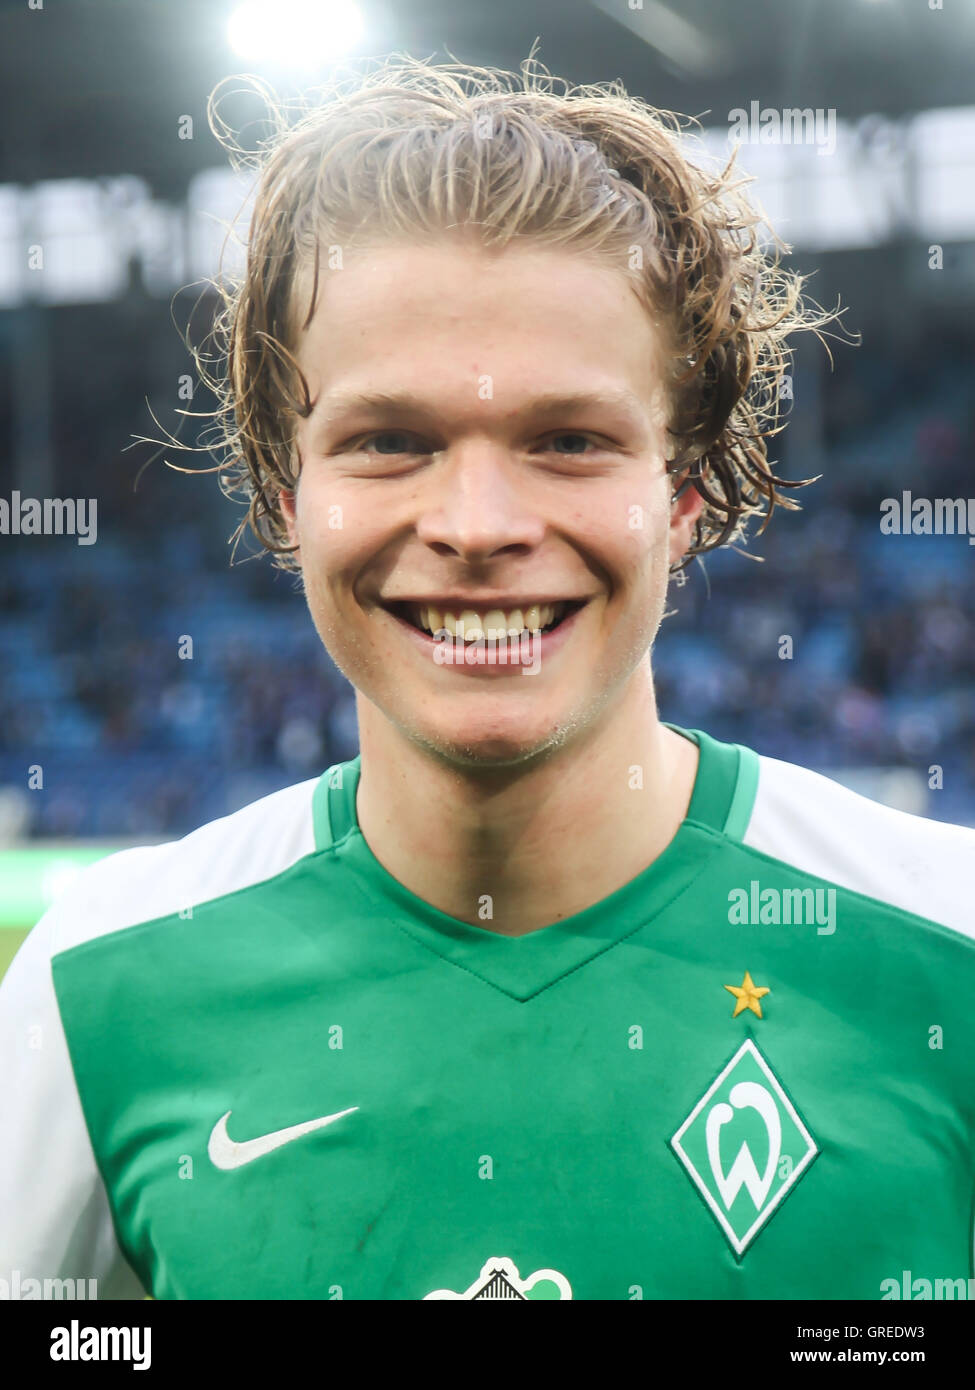 Jesper Verlaat Werder Bremen 3. Liga 2015 2016 Season League Game Against 1.Fc Magdeburg U23 Werder Bremen In Magdeburg - Stock Image